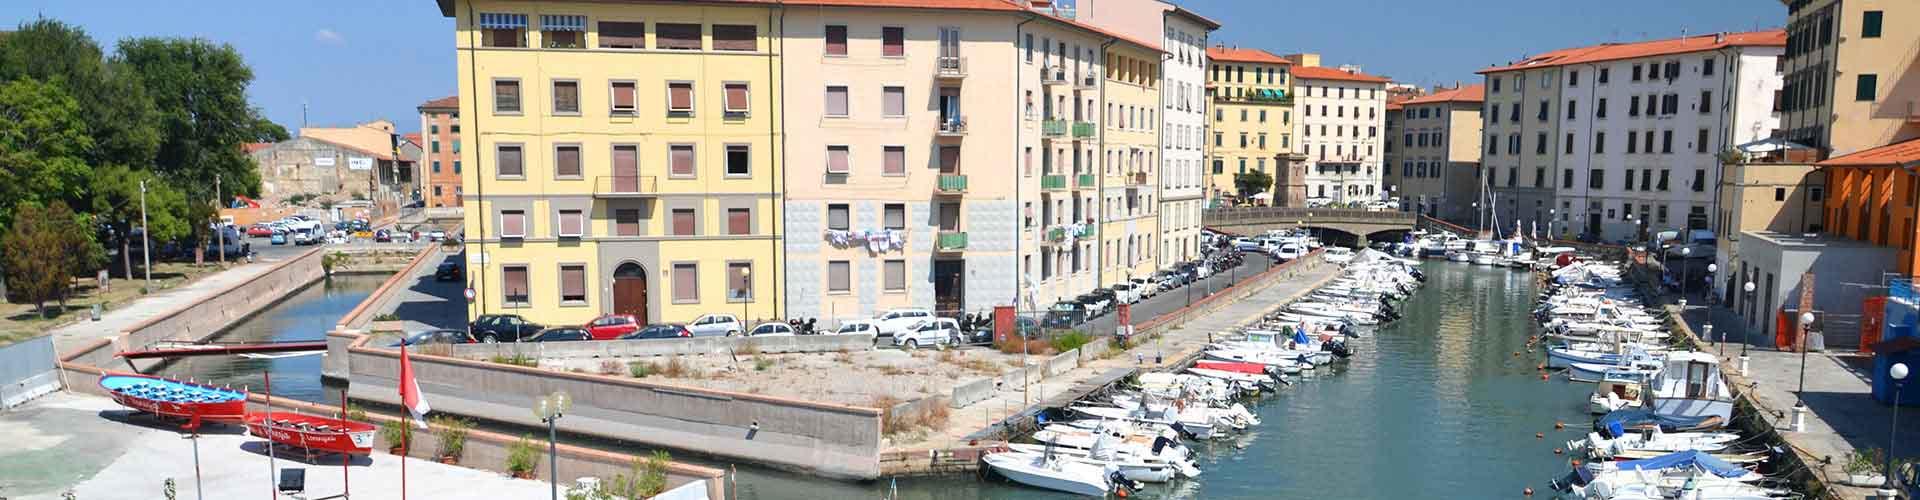 Livorno - Auberges de jeunesse à Livorno. Cartes pour Livorno, photos et commentaires pour chaque auberge de jeunesse à Livorno.